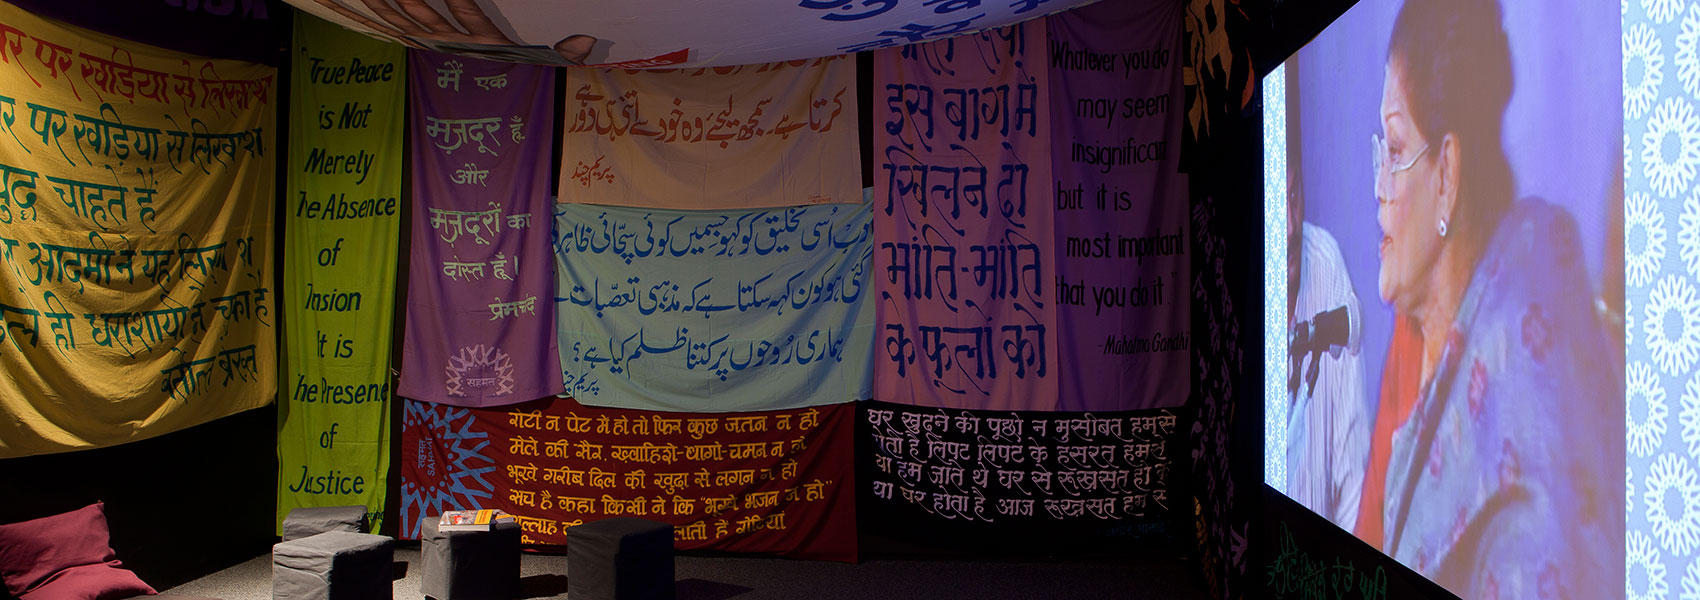 Sahmat banners